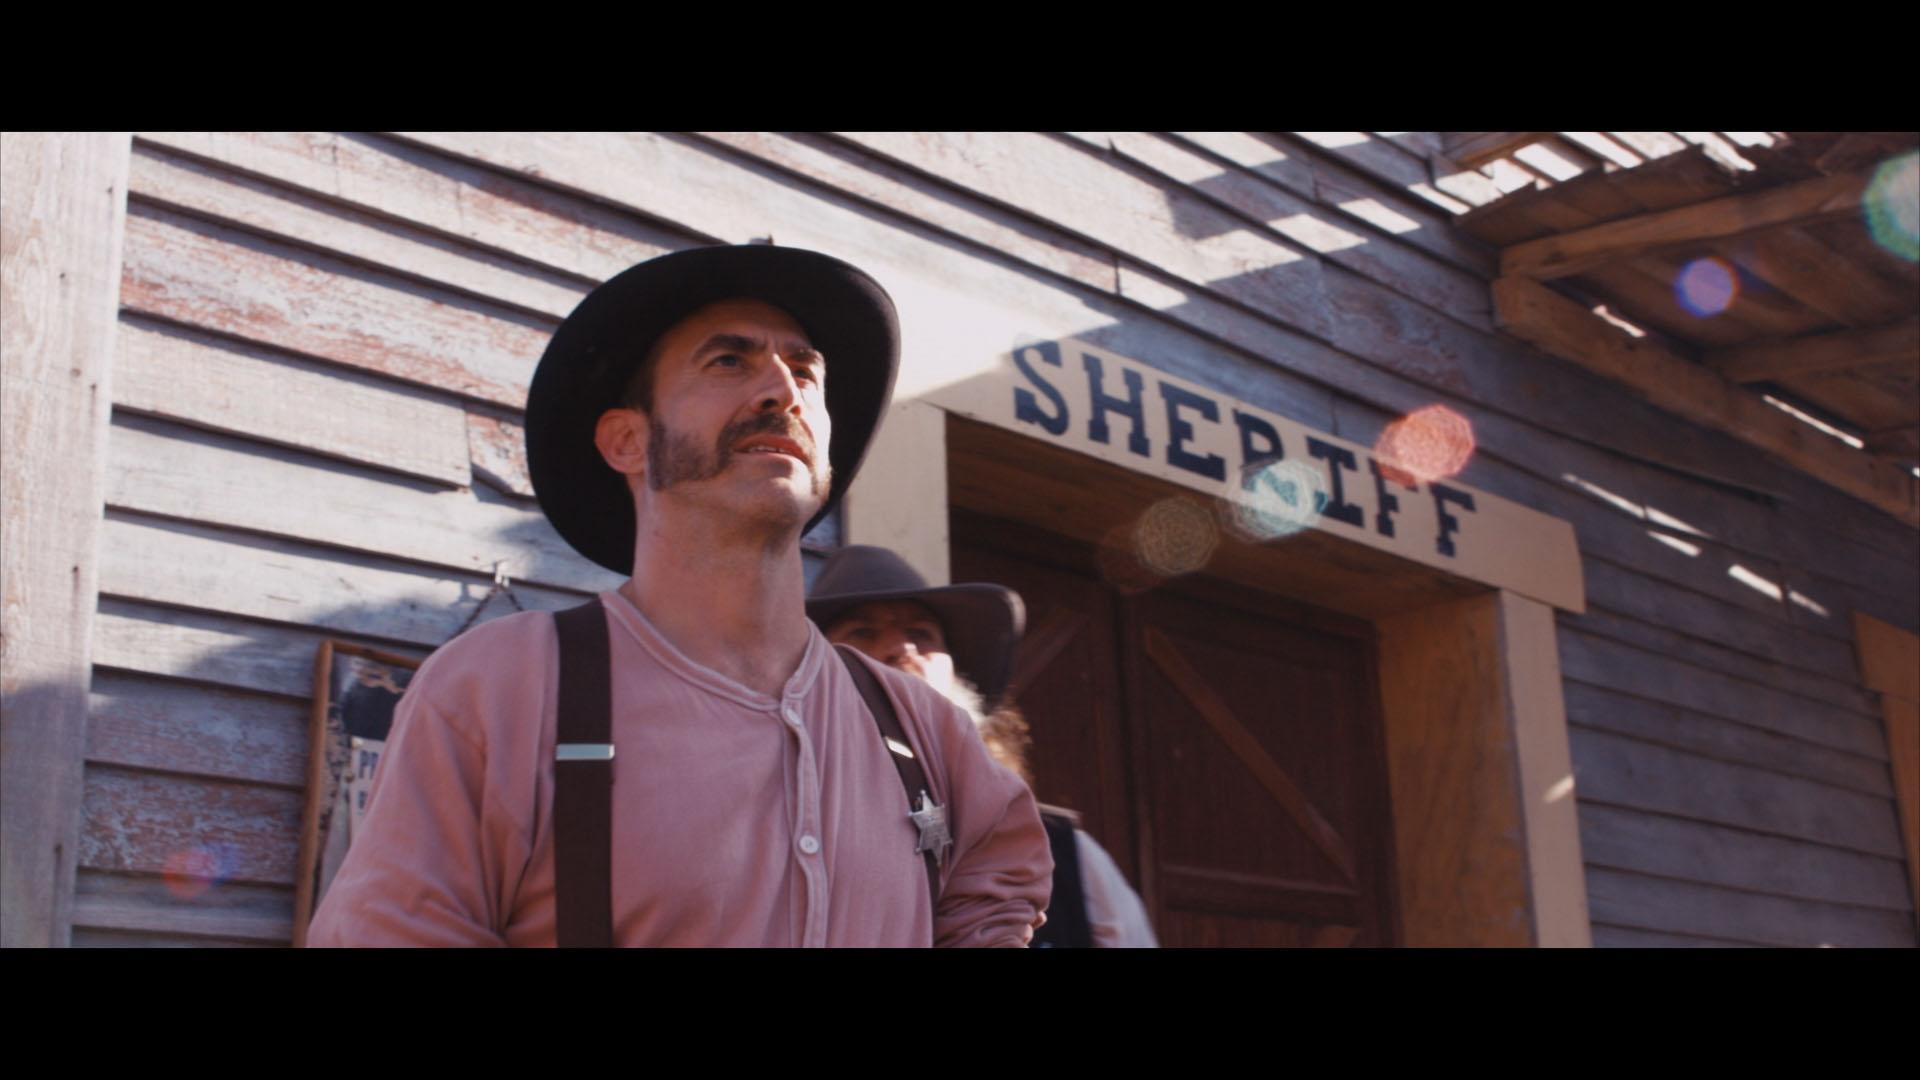 Aaron-Stielstra_Sheriff-Mosely-02.jpg